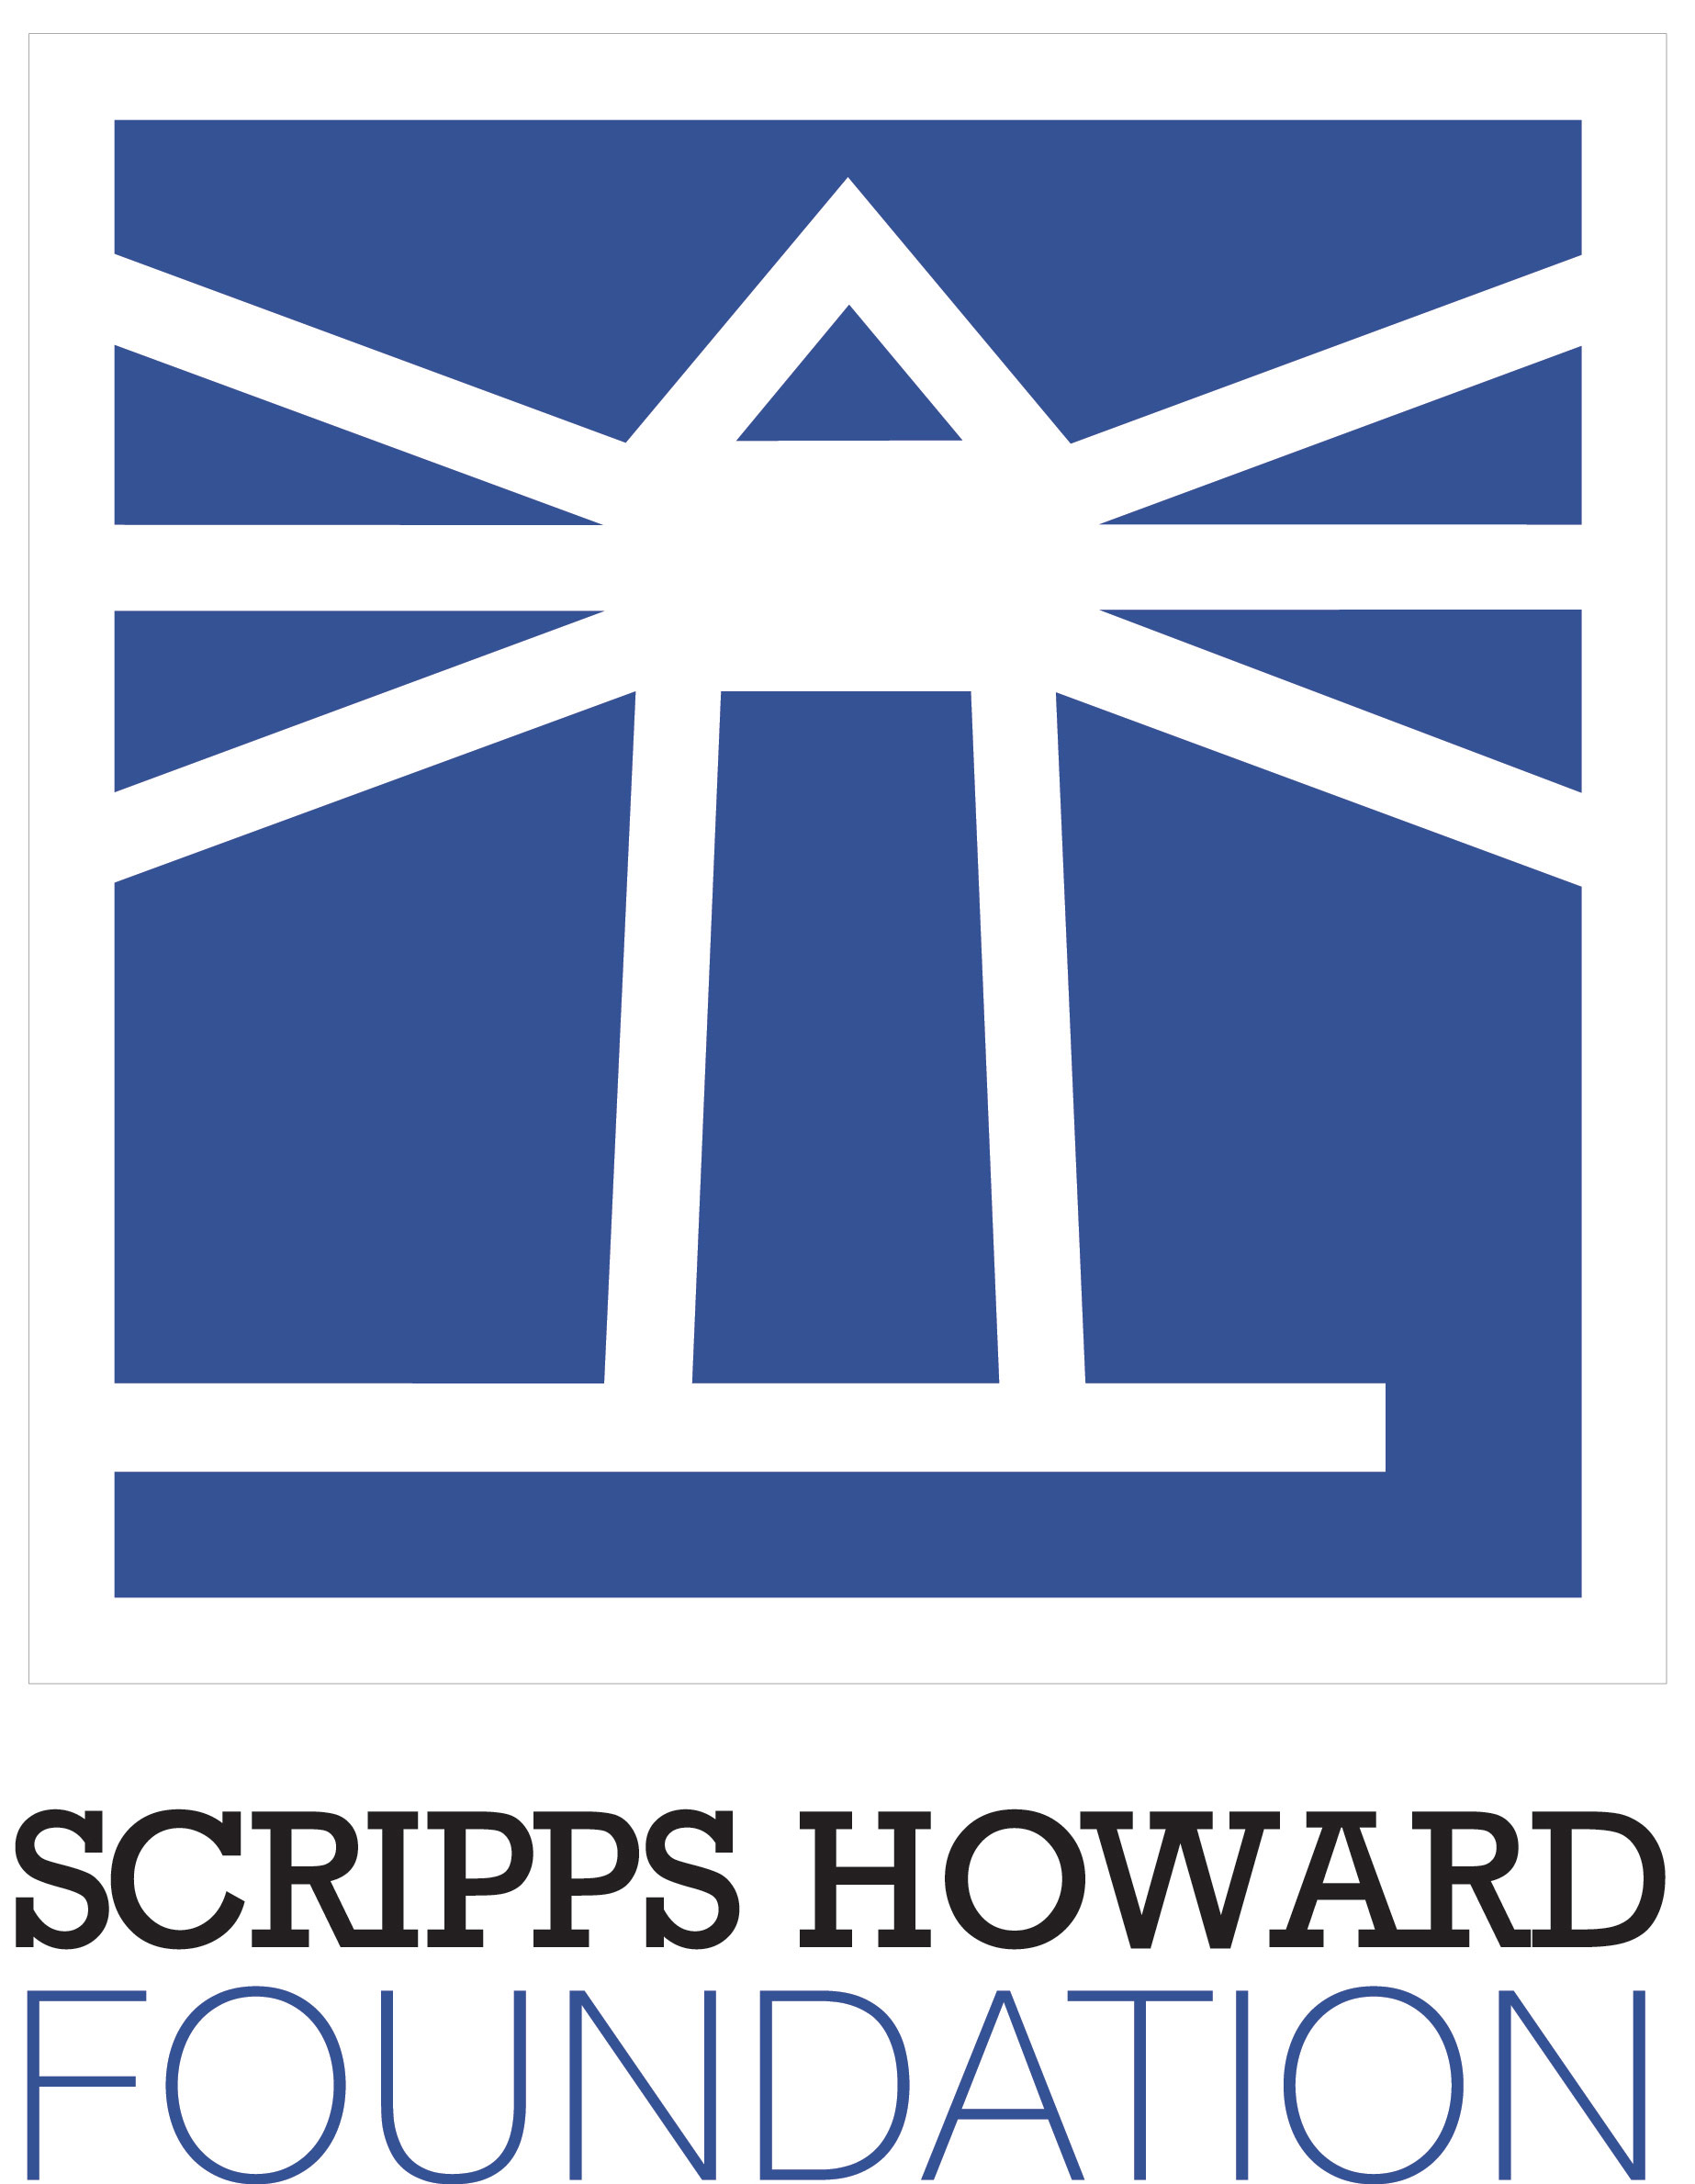 Scripps foundation_logo_vertical_blue.jpg